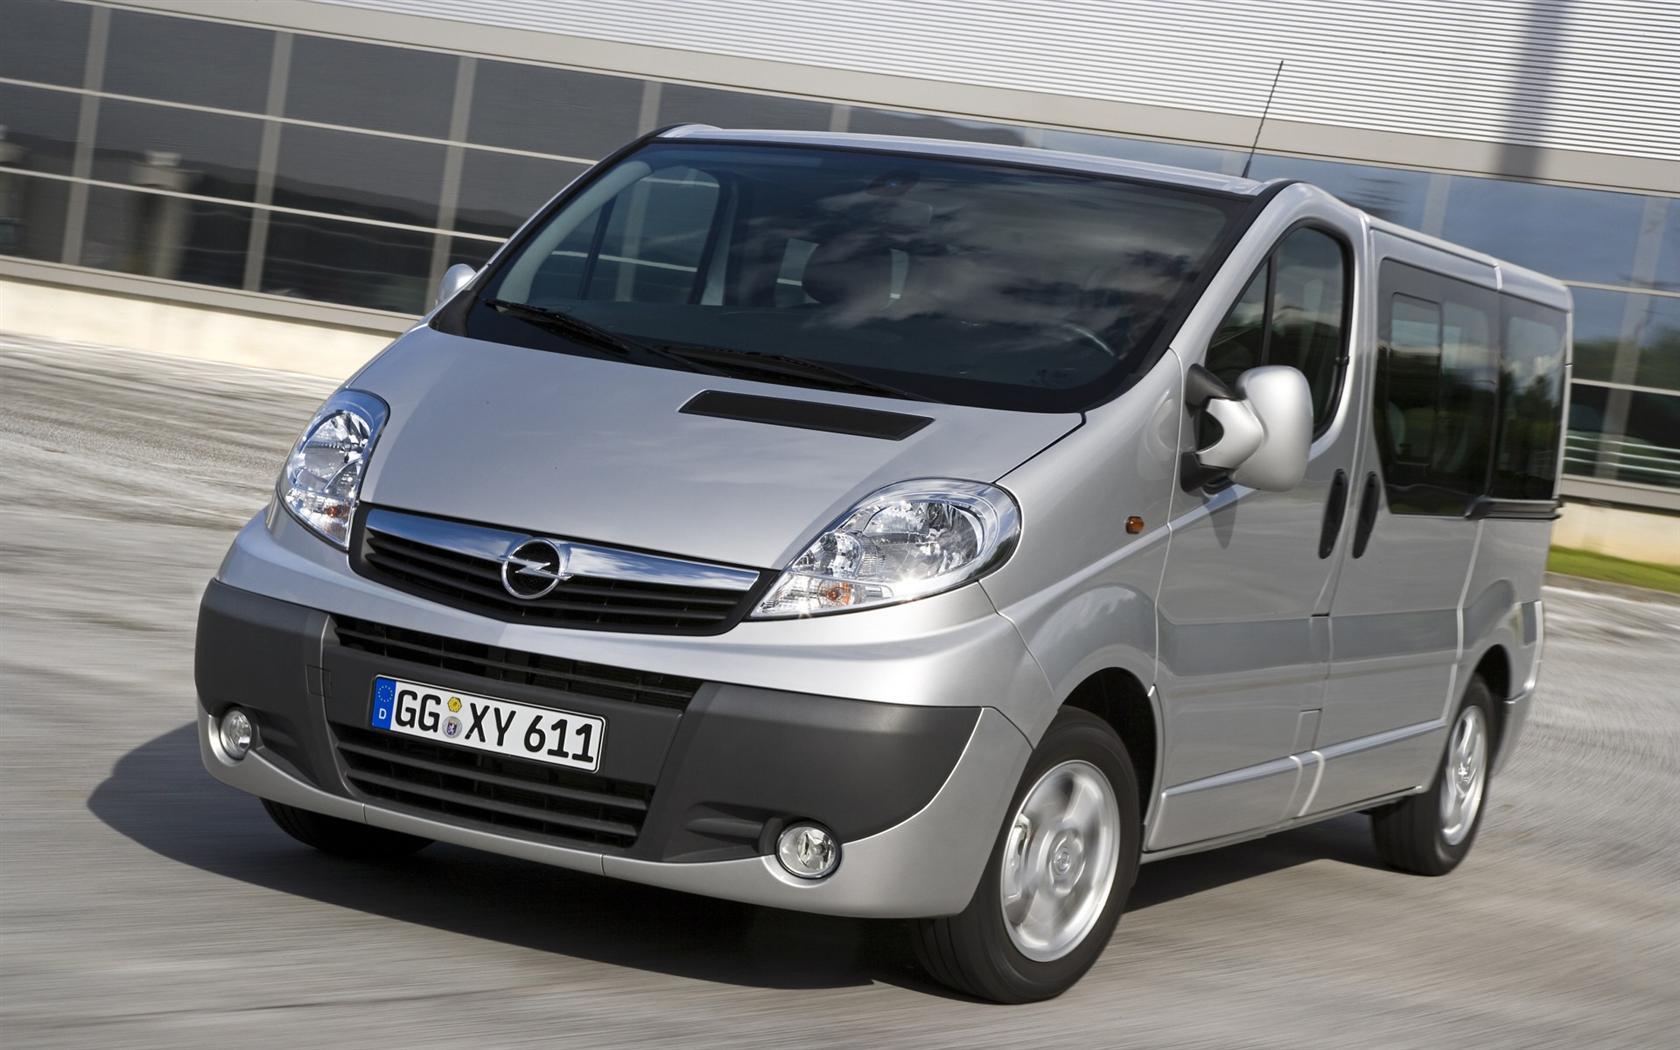 Noleggio Pulmino Opel Vivaro Cesena  Noleggio Autocoming